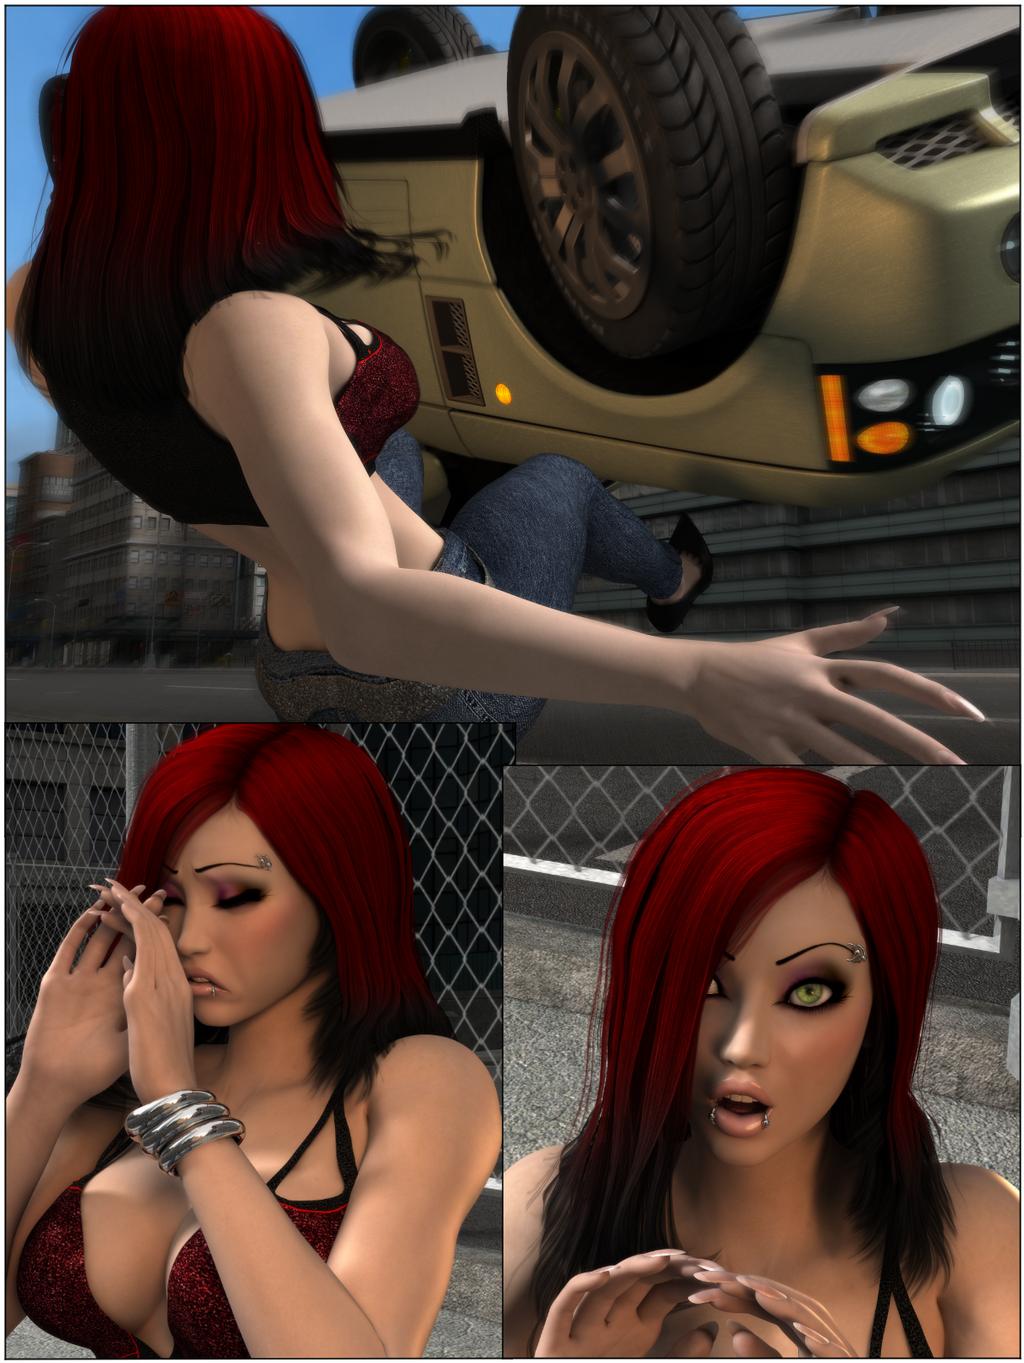 Car Crash 02 by willdial